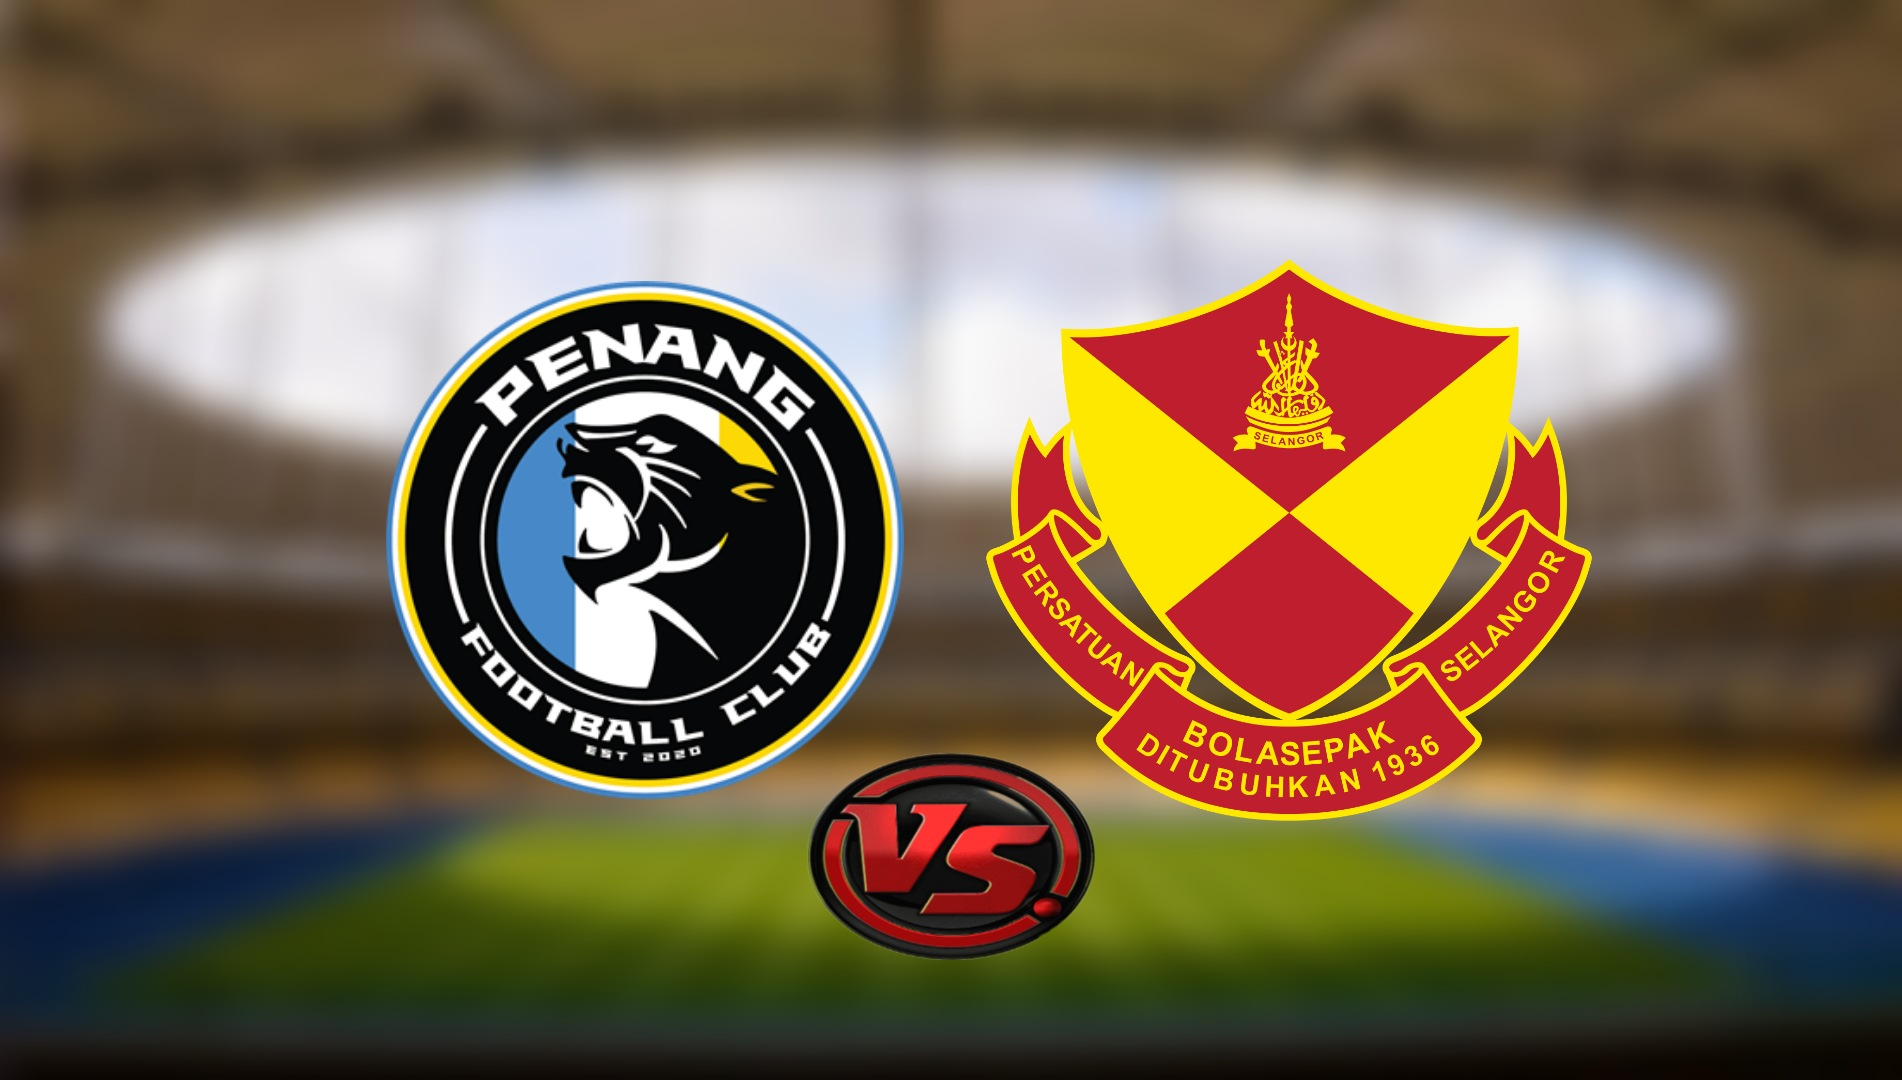 Live Streaming Penang FC vs Selangor FC Liga Super 31.7.2021